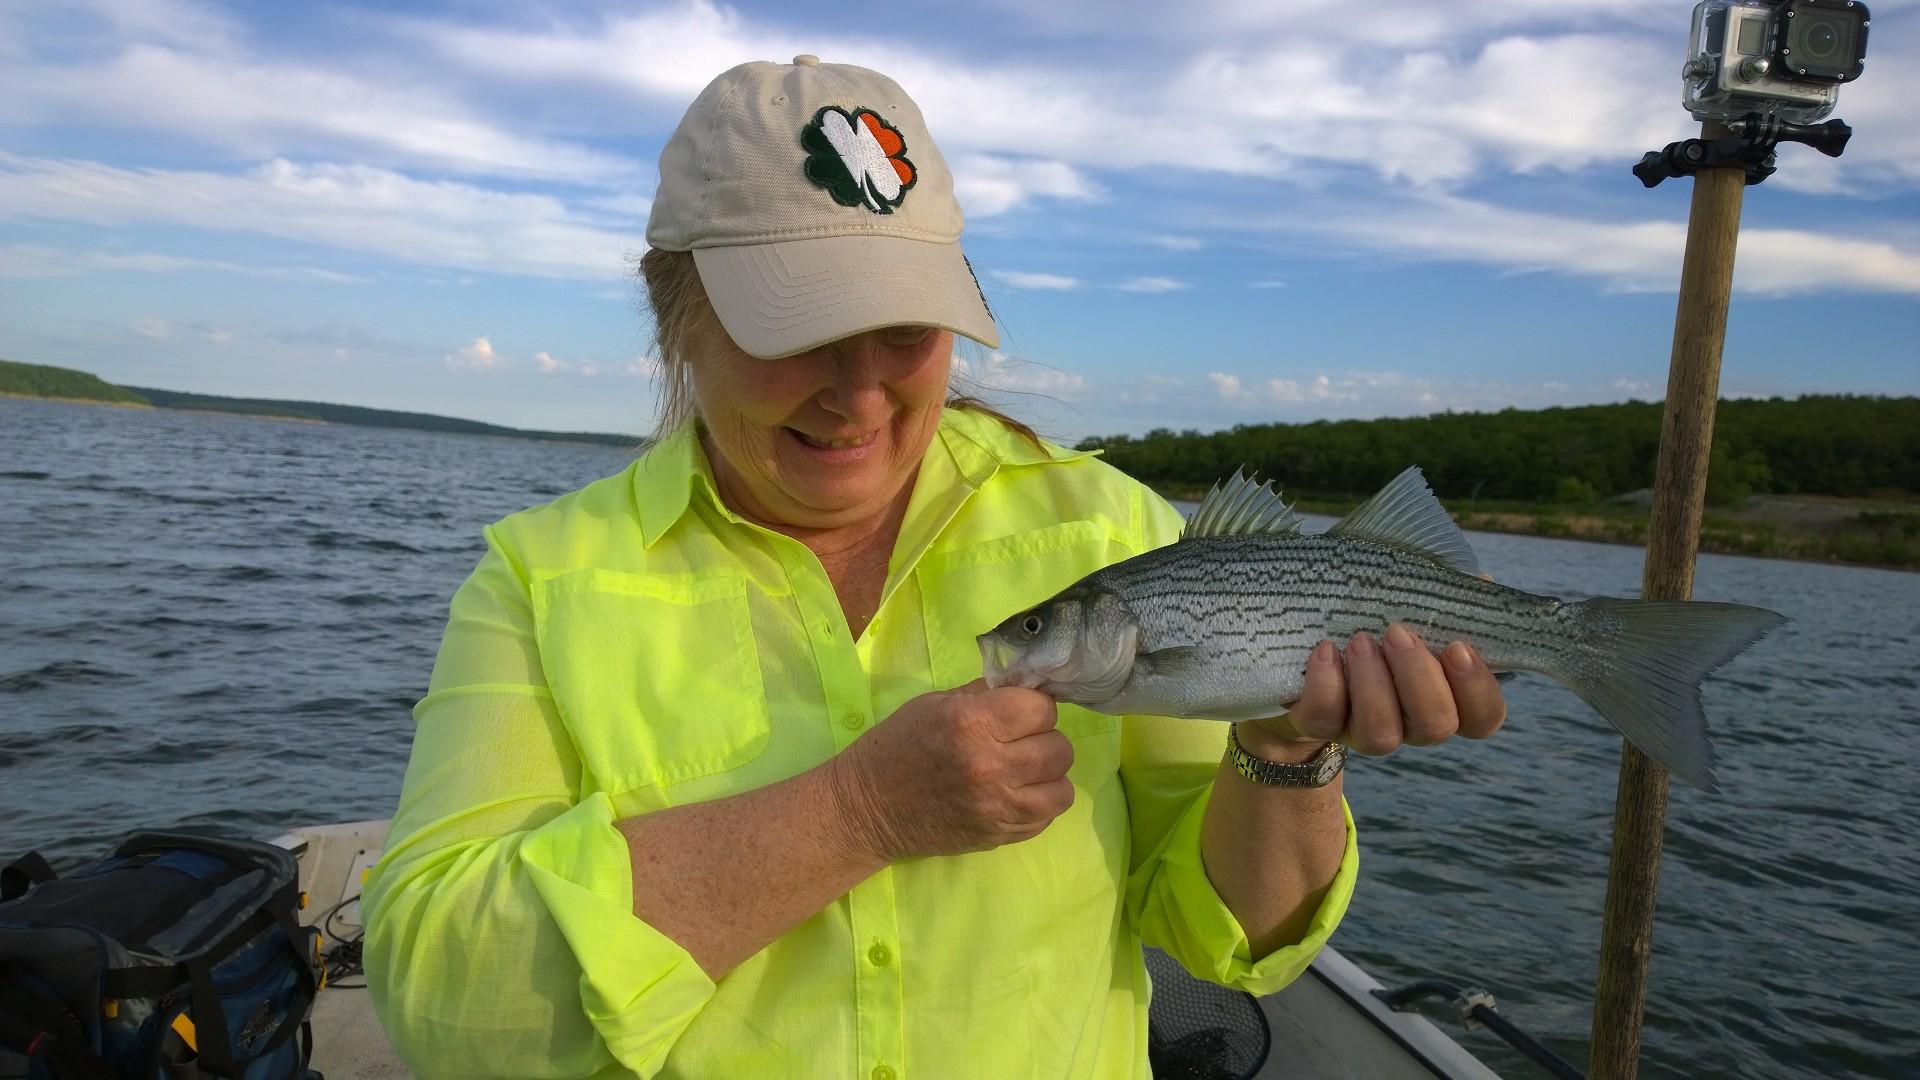 June 8th skiatook lake fishing for hybrid striper pray for Fishing in oklahoma